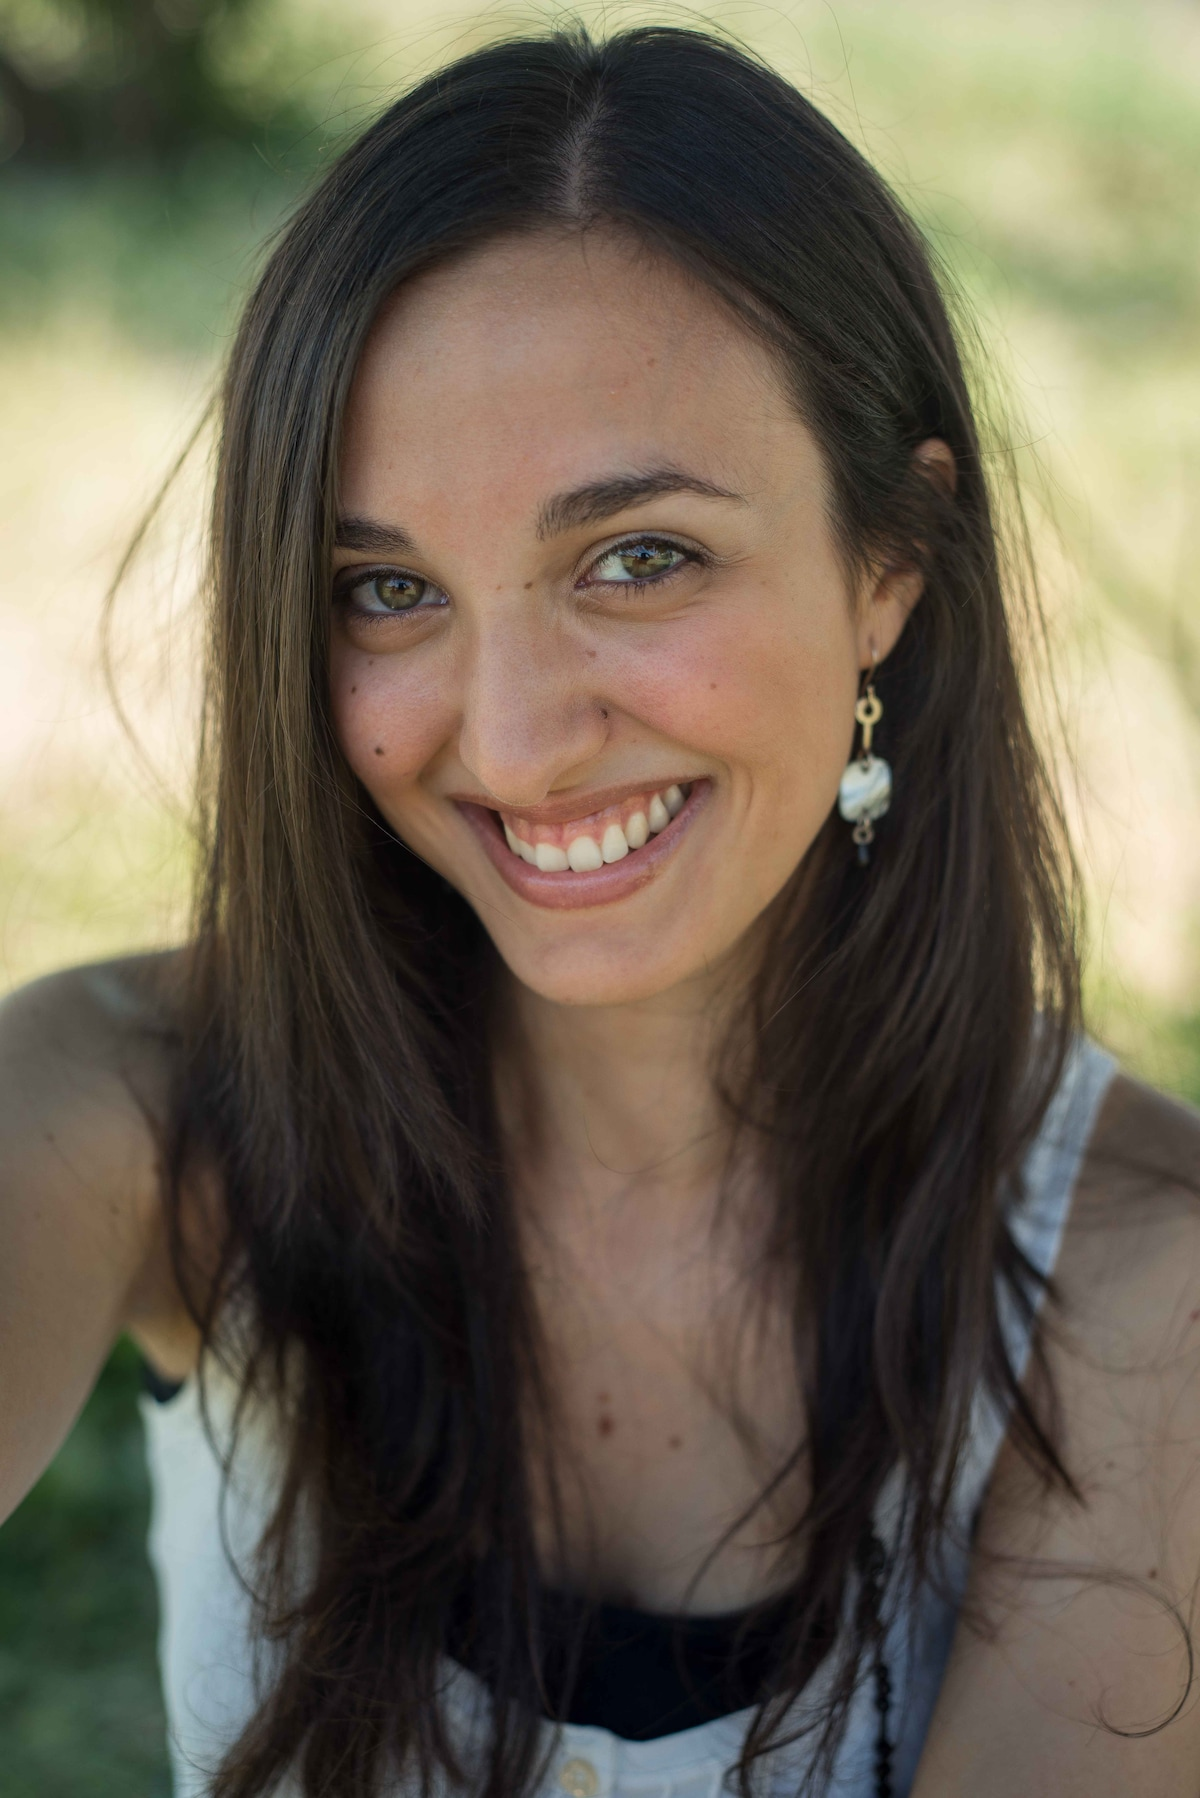 Francesca from Sinnai